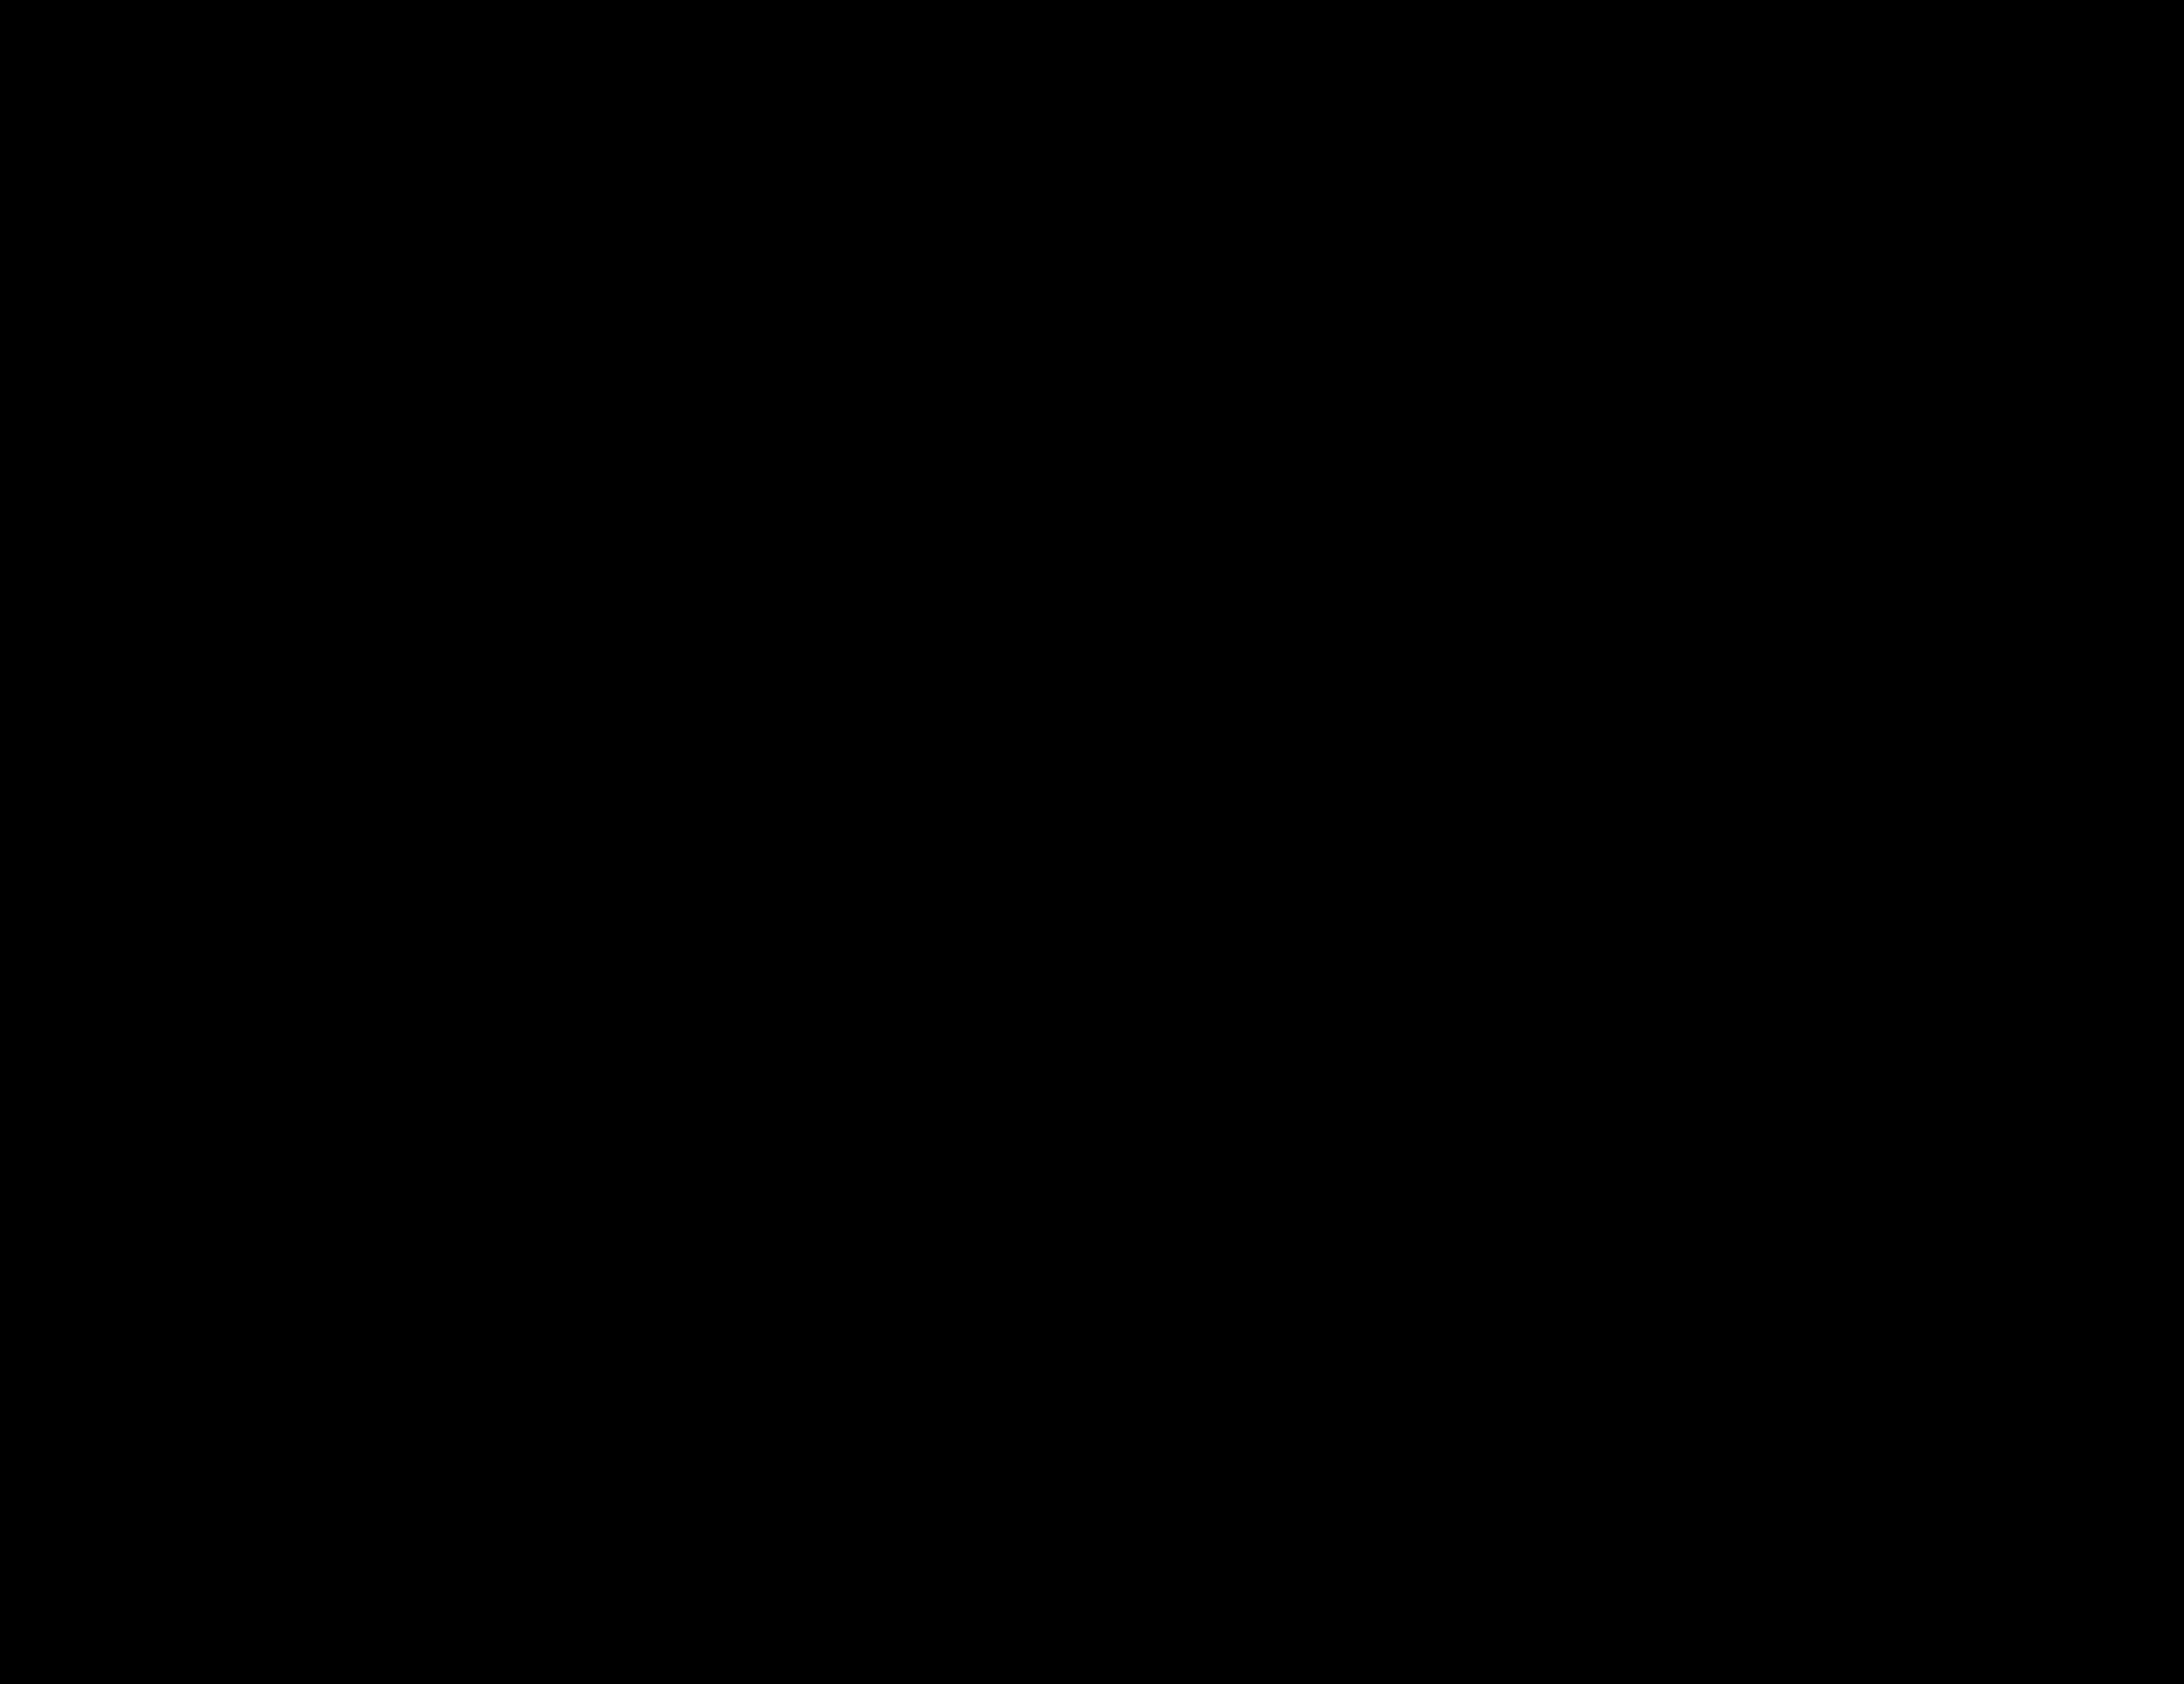 2398x1849 Clipart